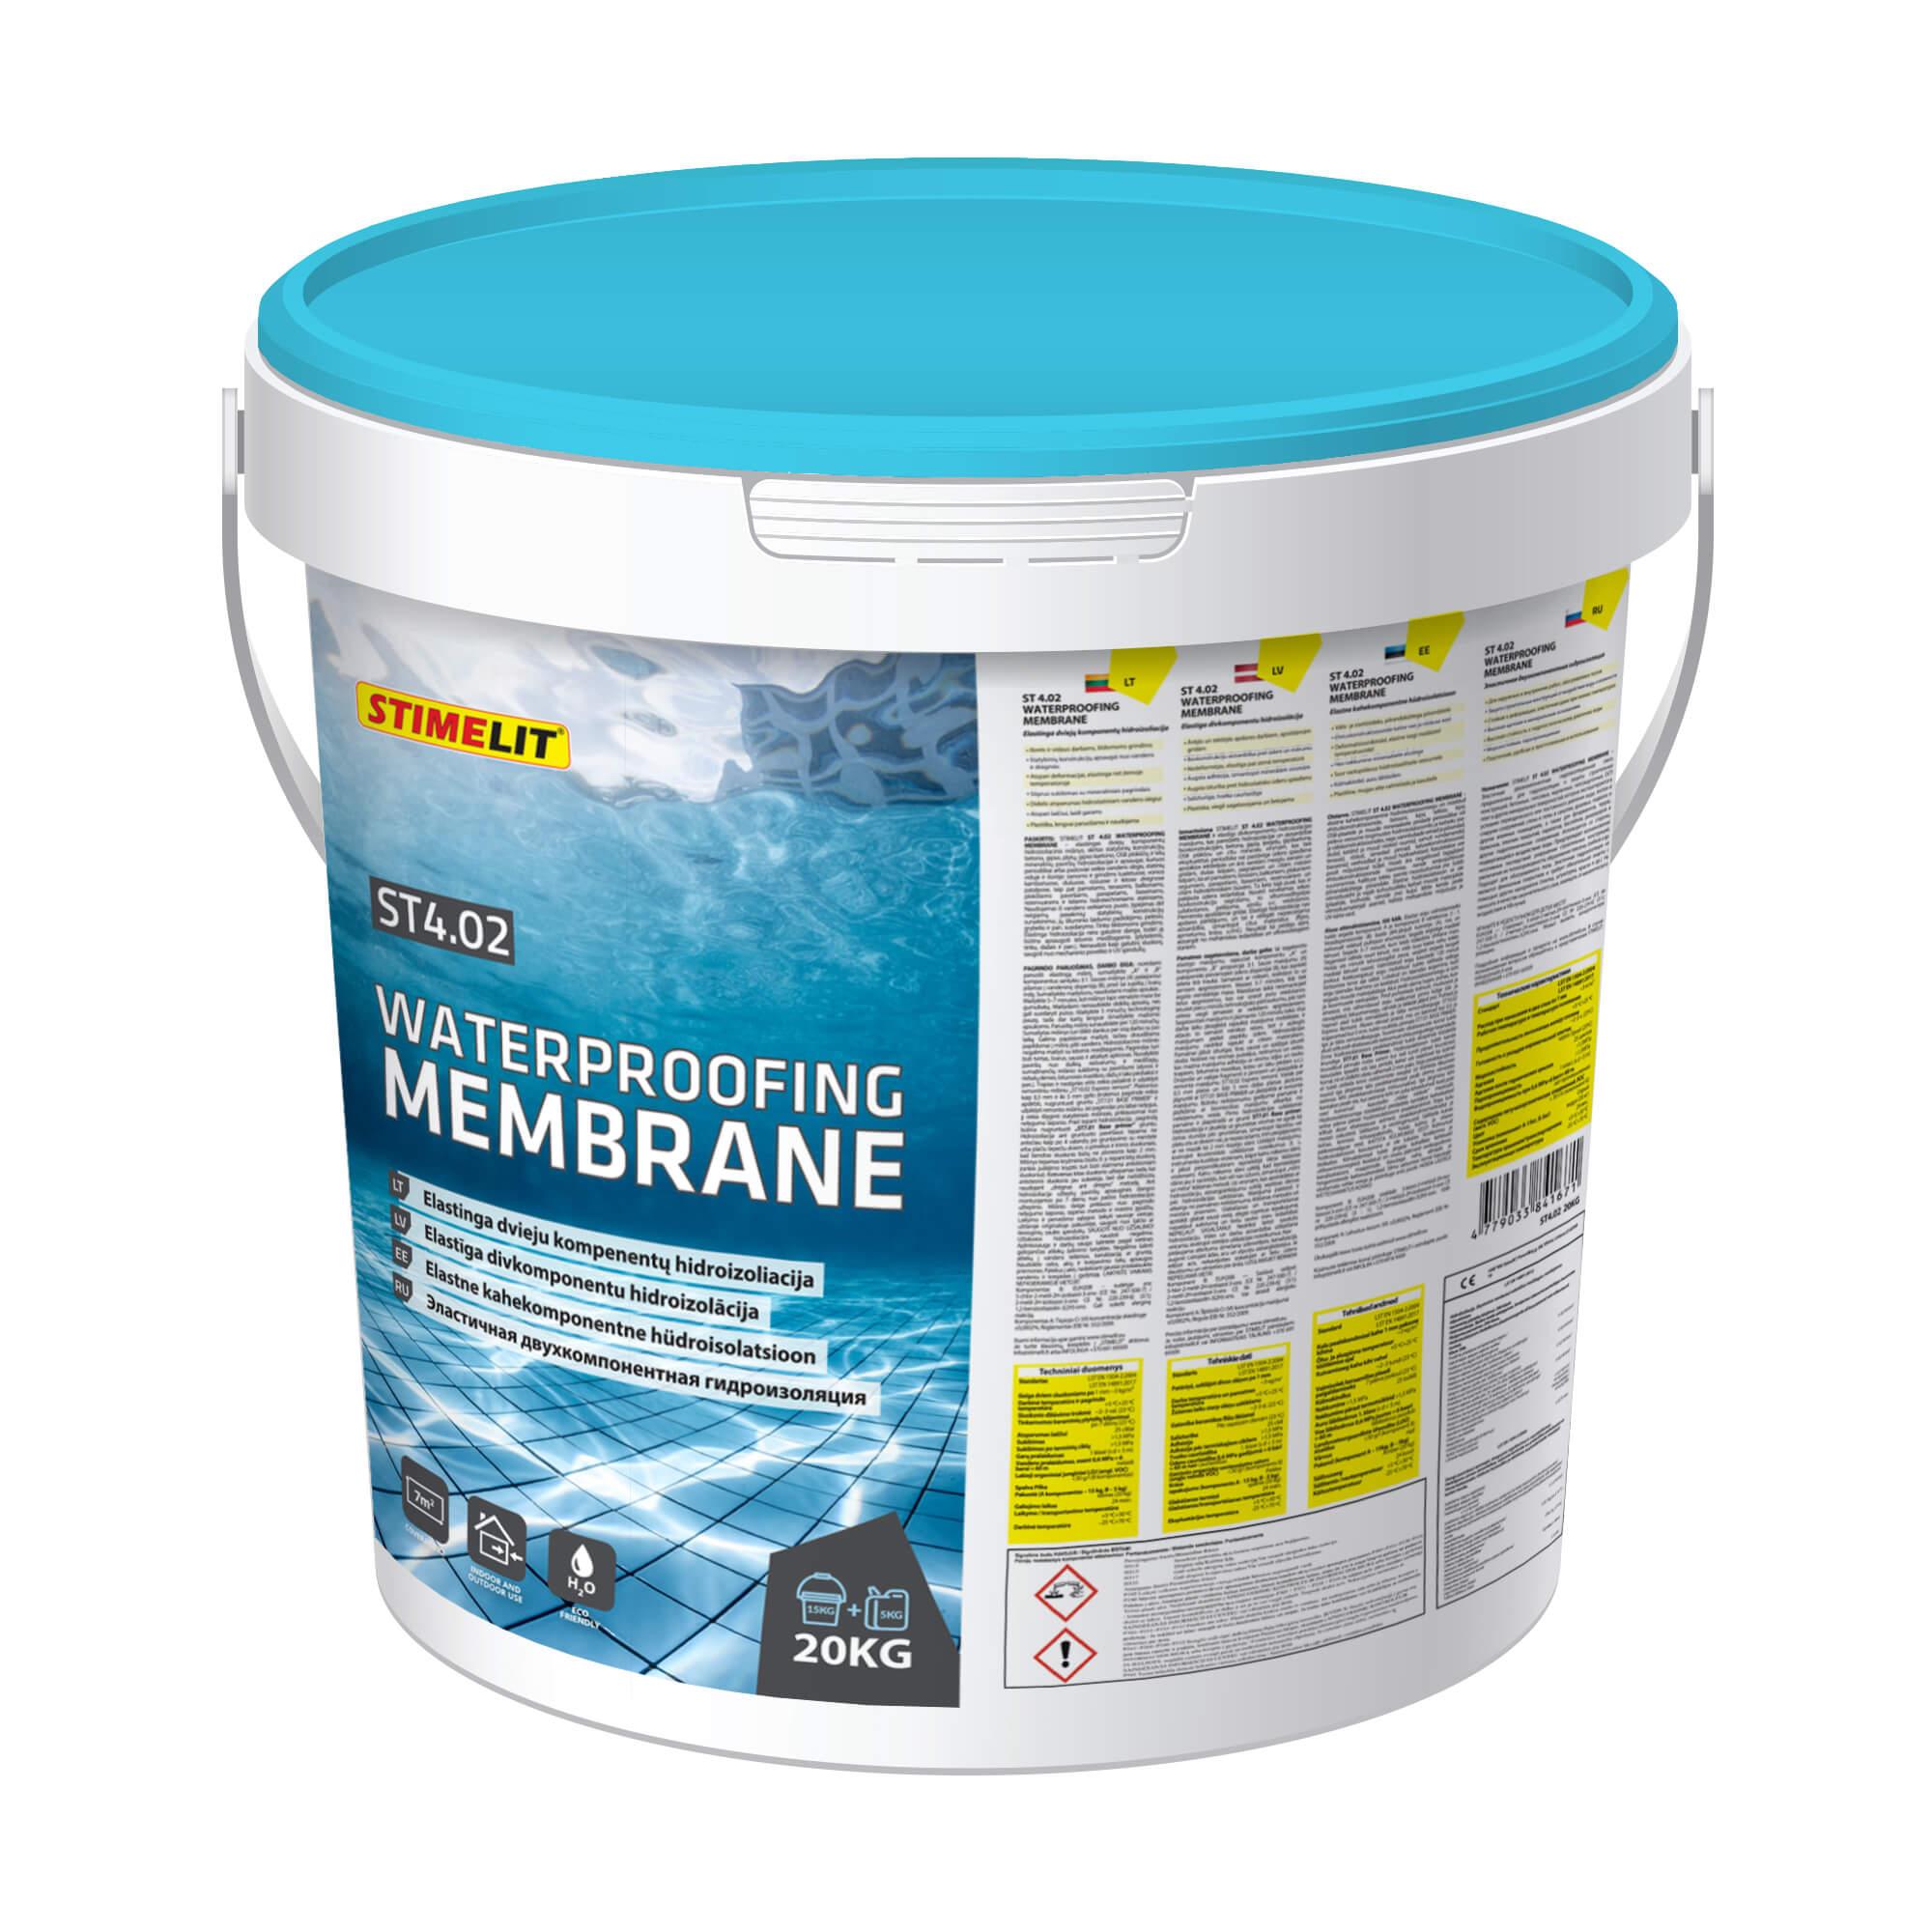 ST4.02 WATERPROOFING MEMBRANE Elastīga divkomponentu hidroizolācija